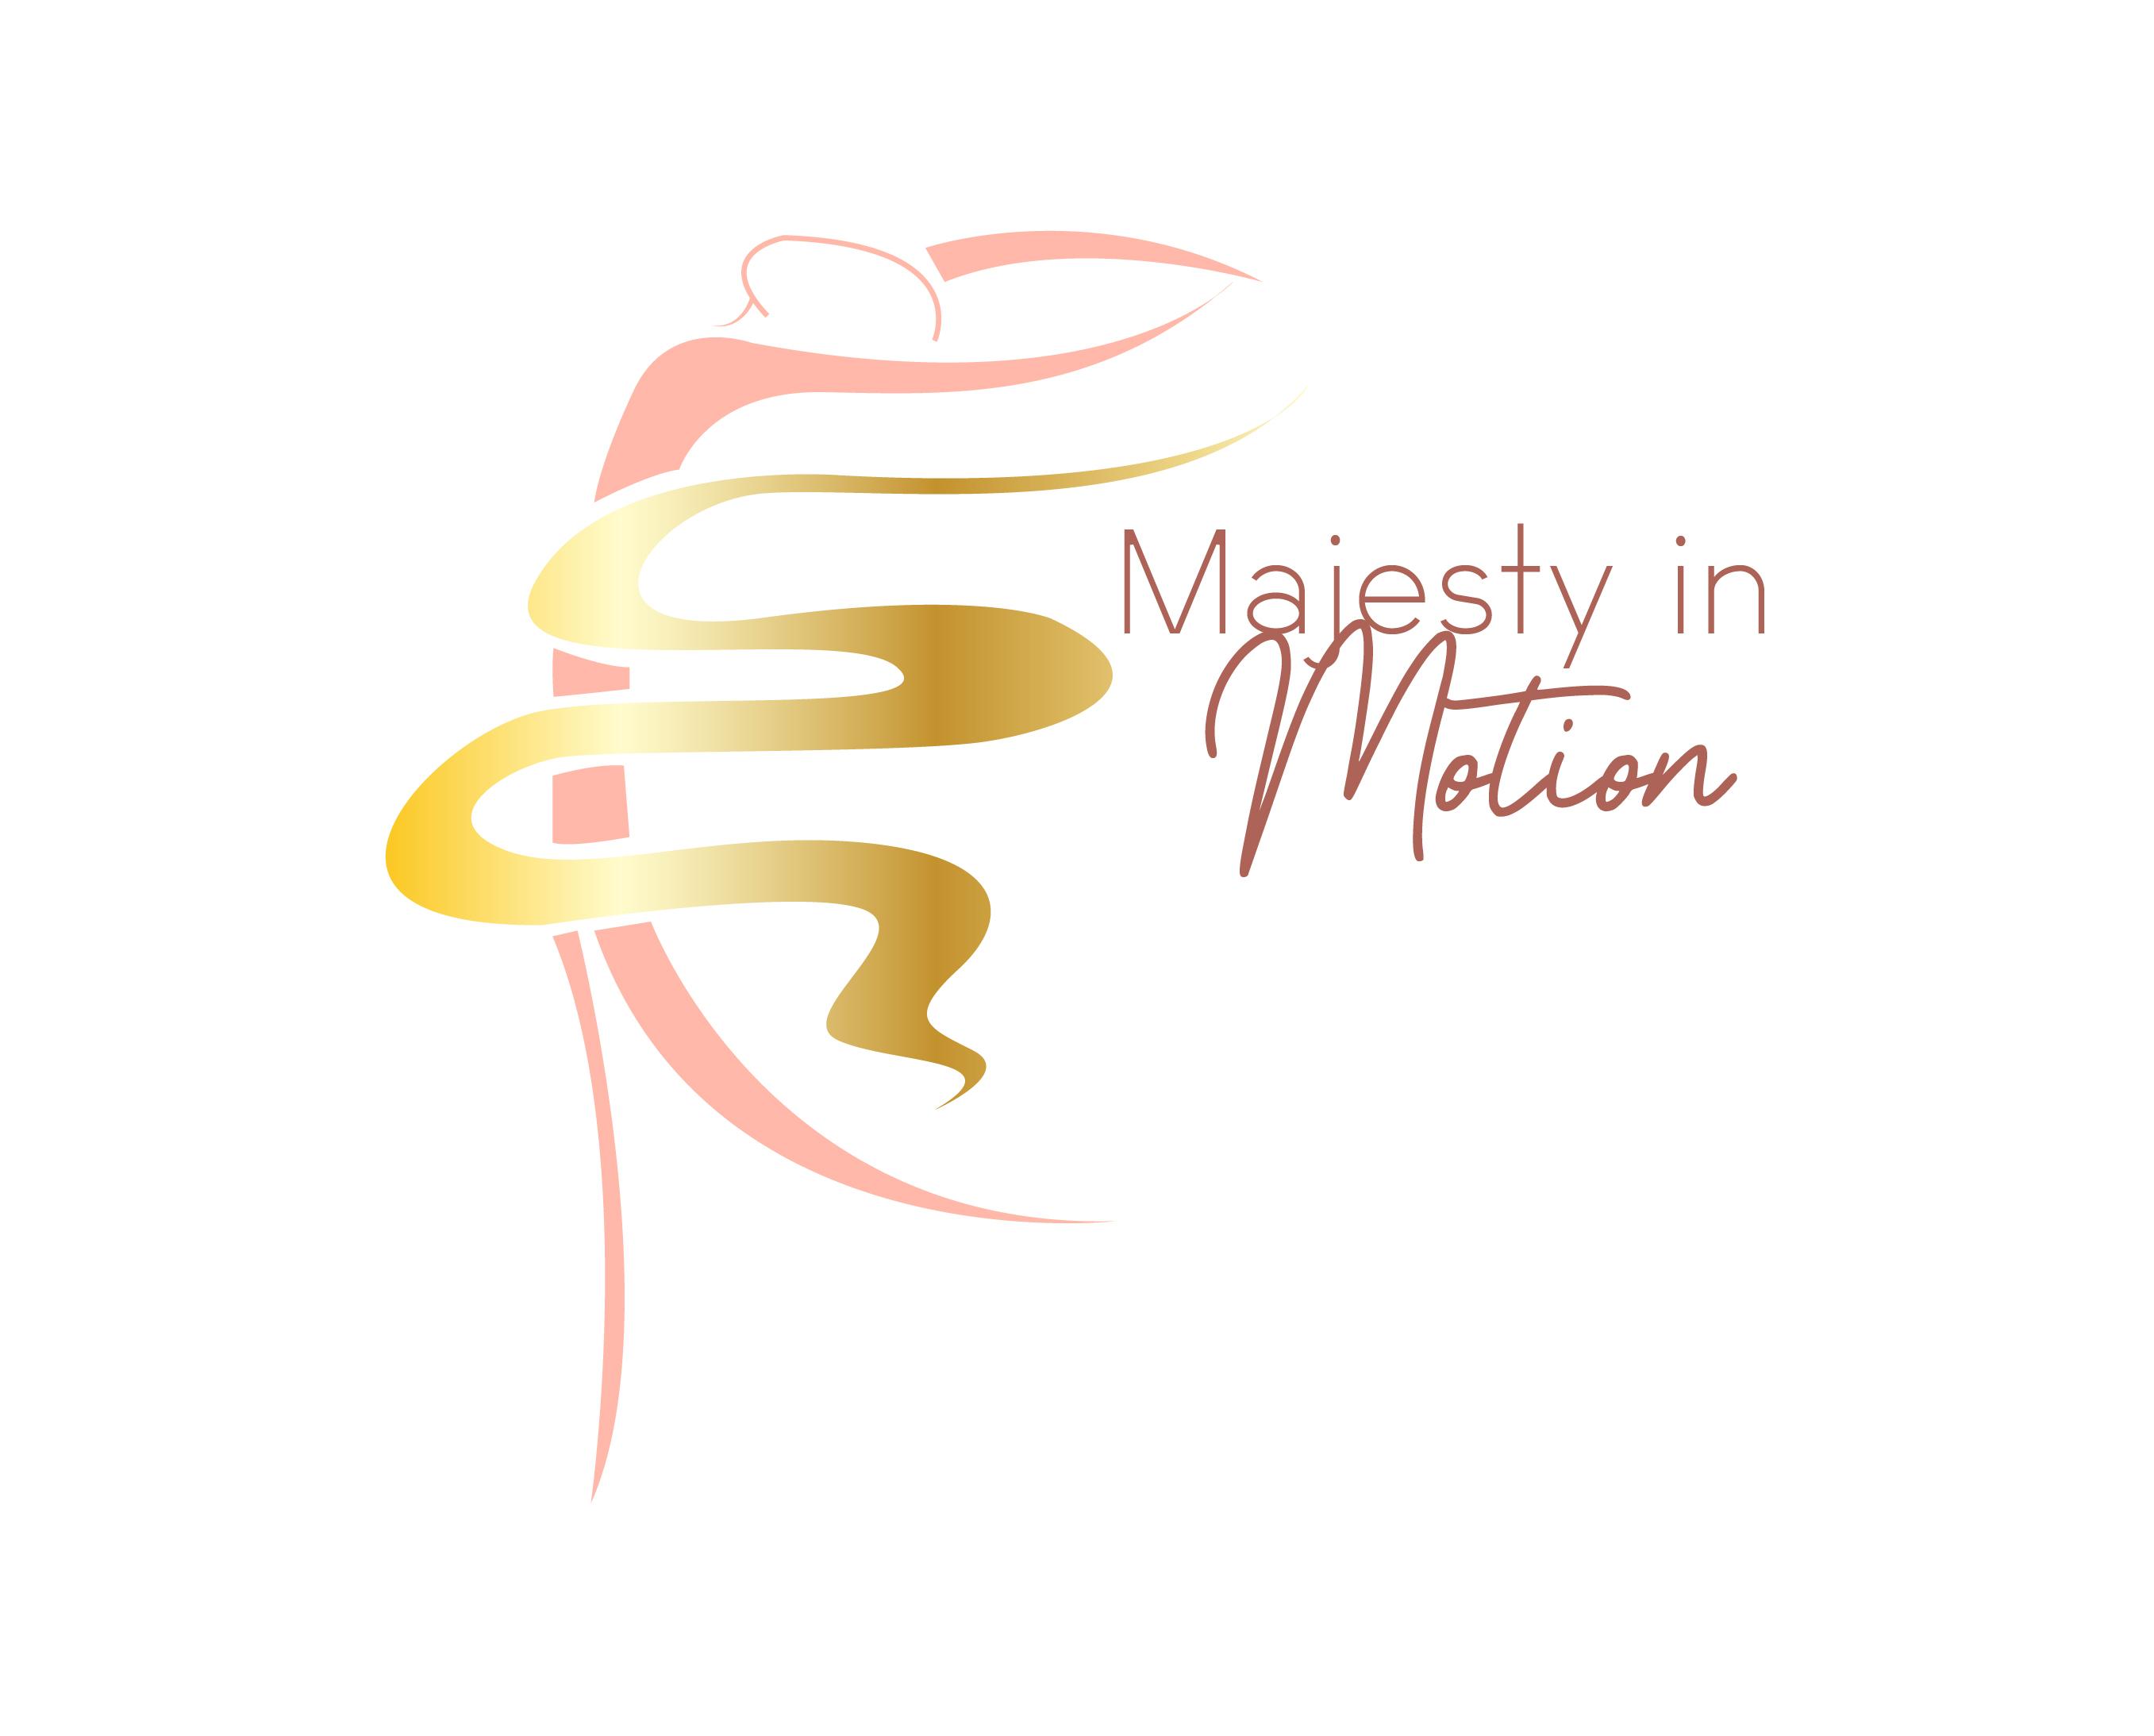 majesty in motion-04